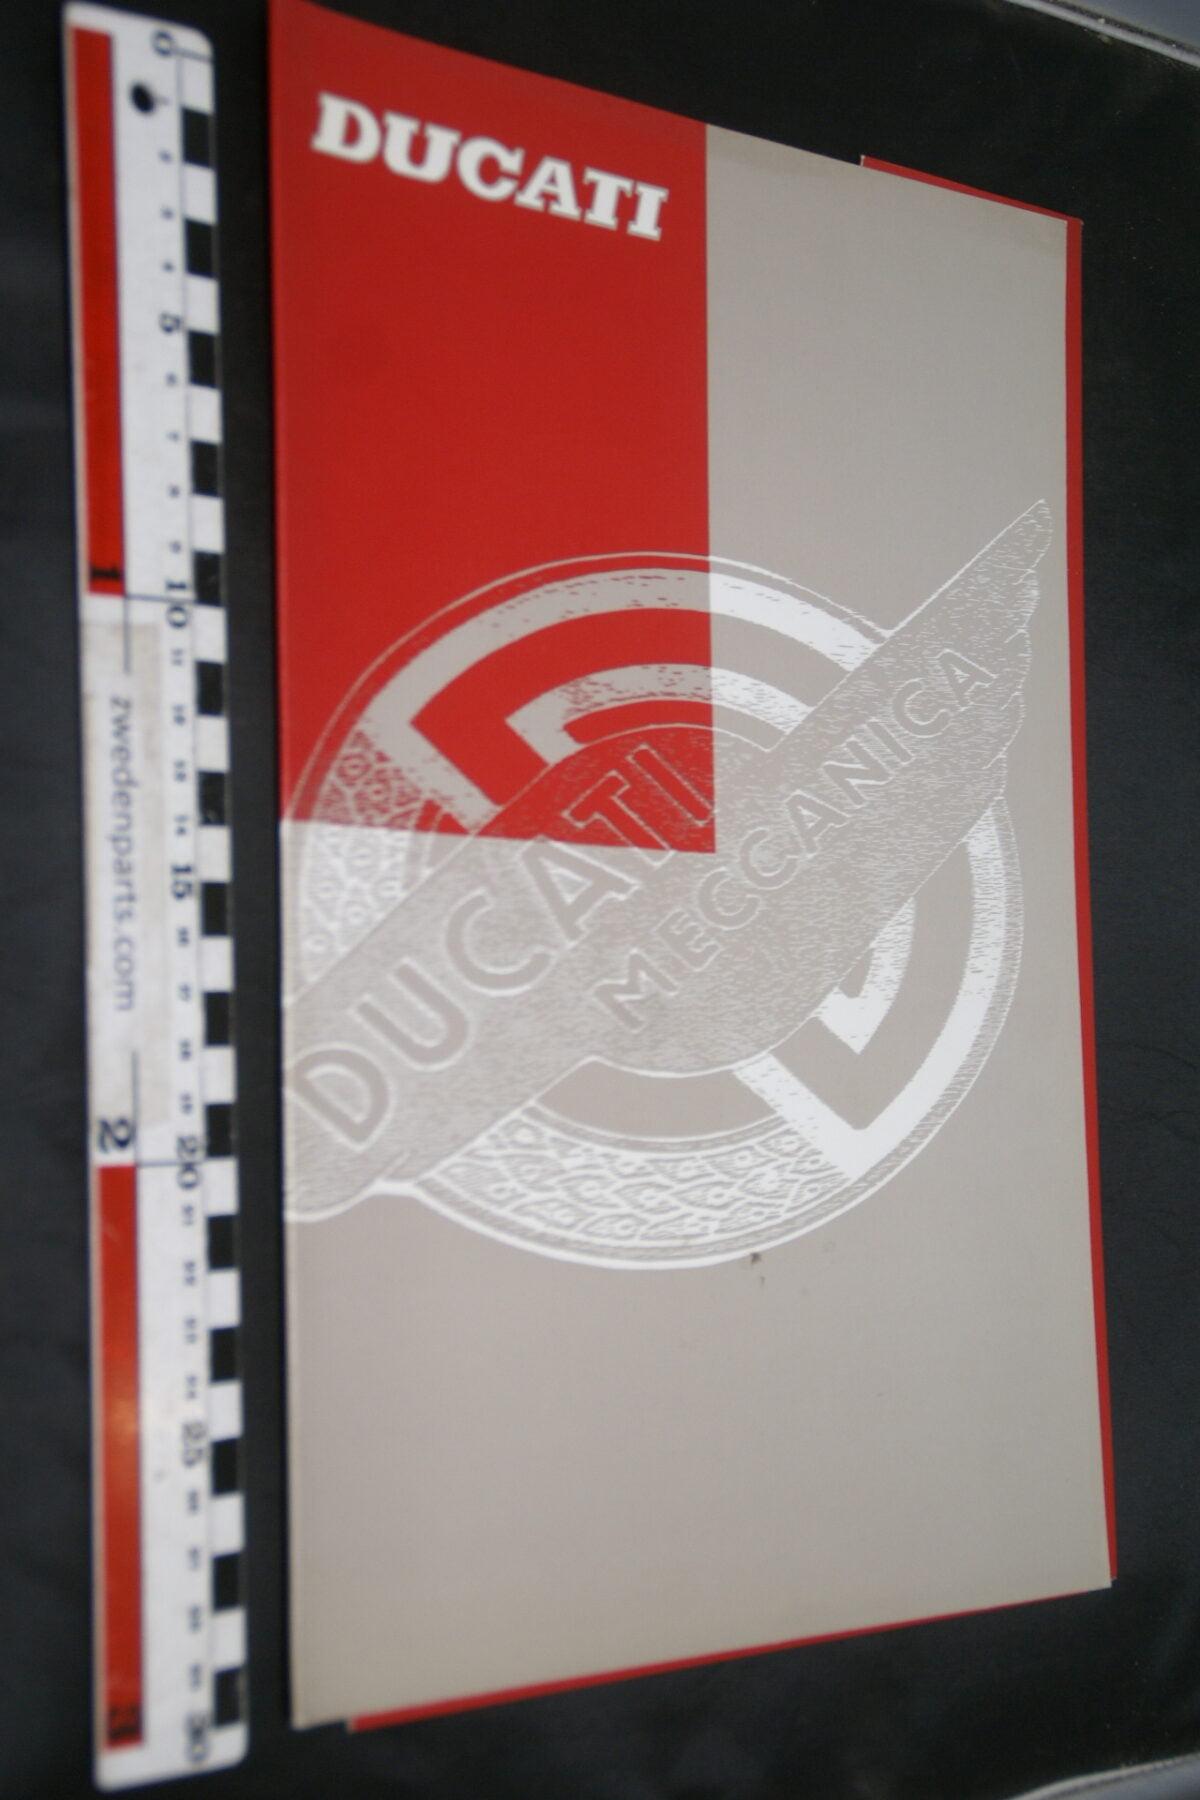 DSC02233 ca. 1995 originele persmap Ducati motorfietsen-d57c4172